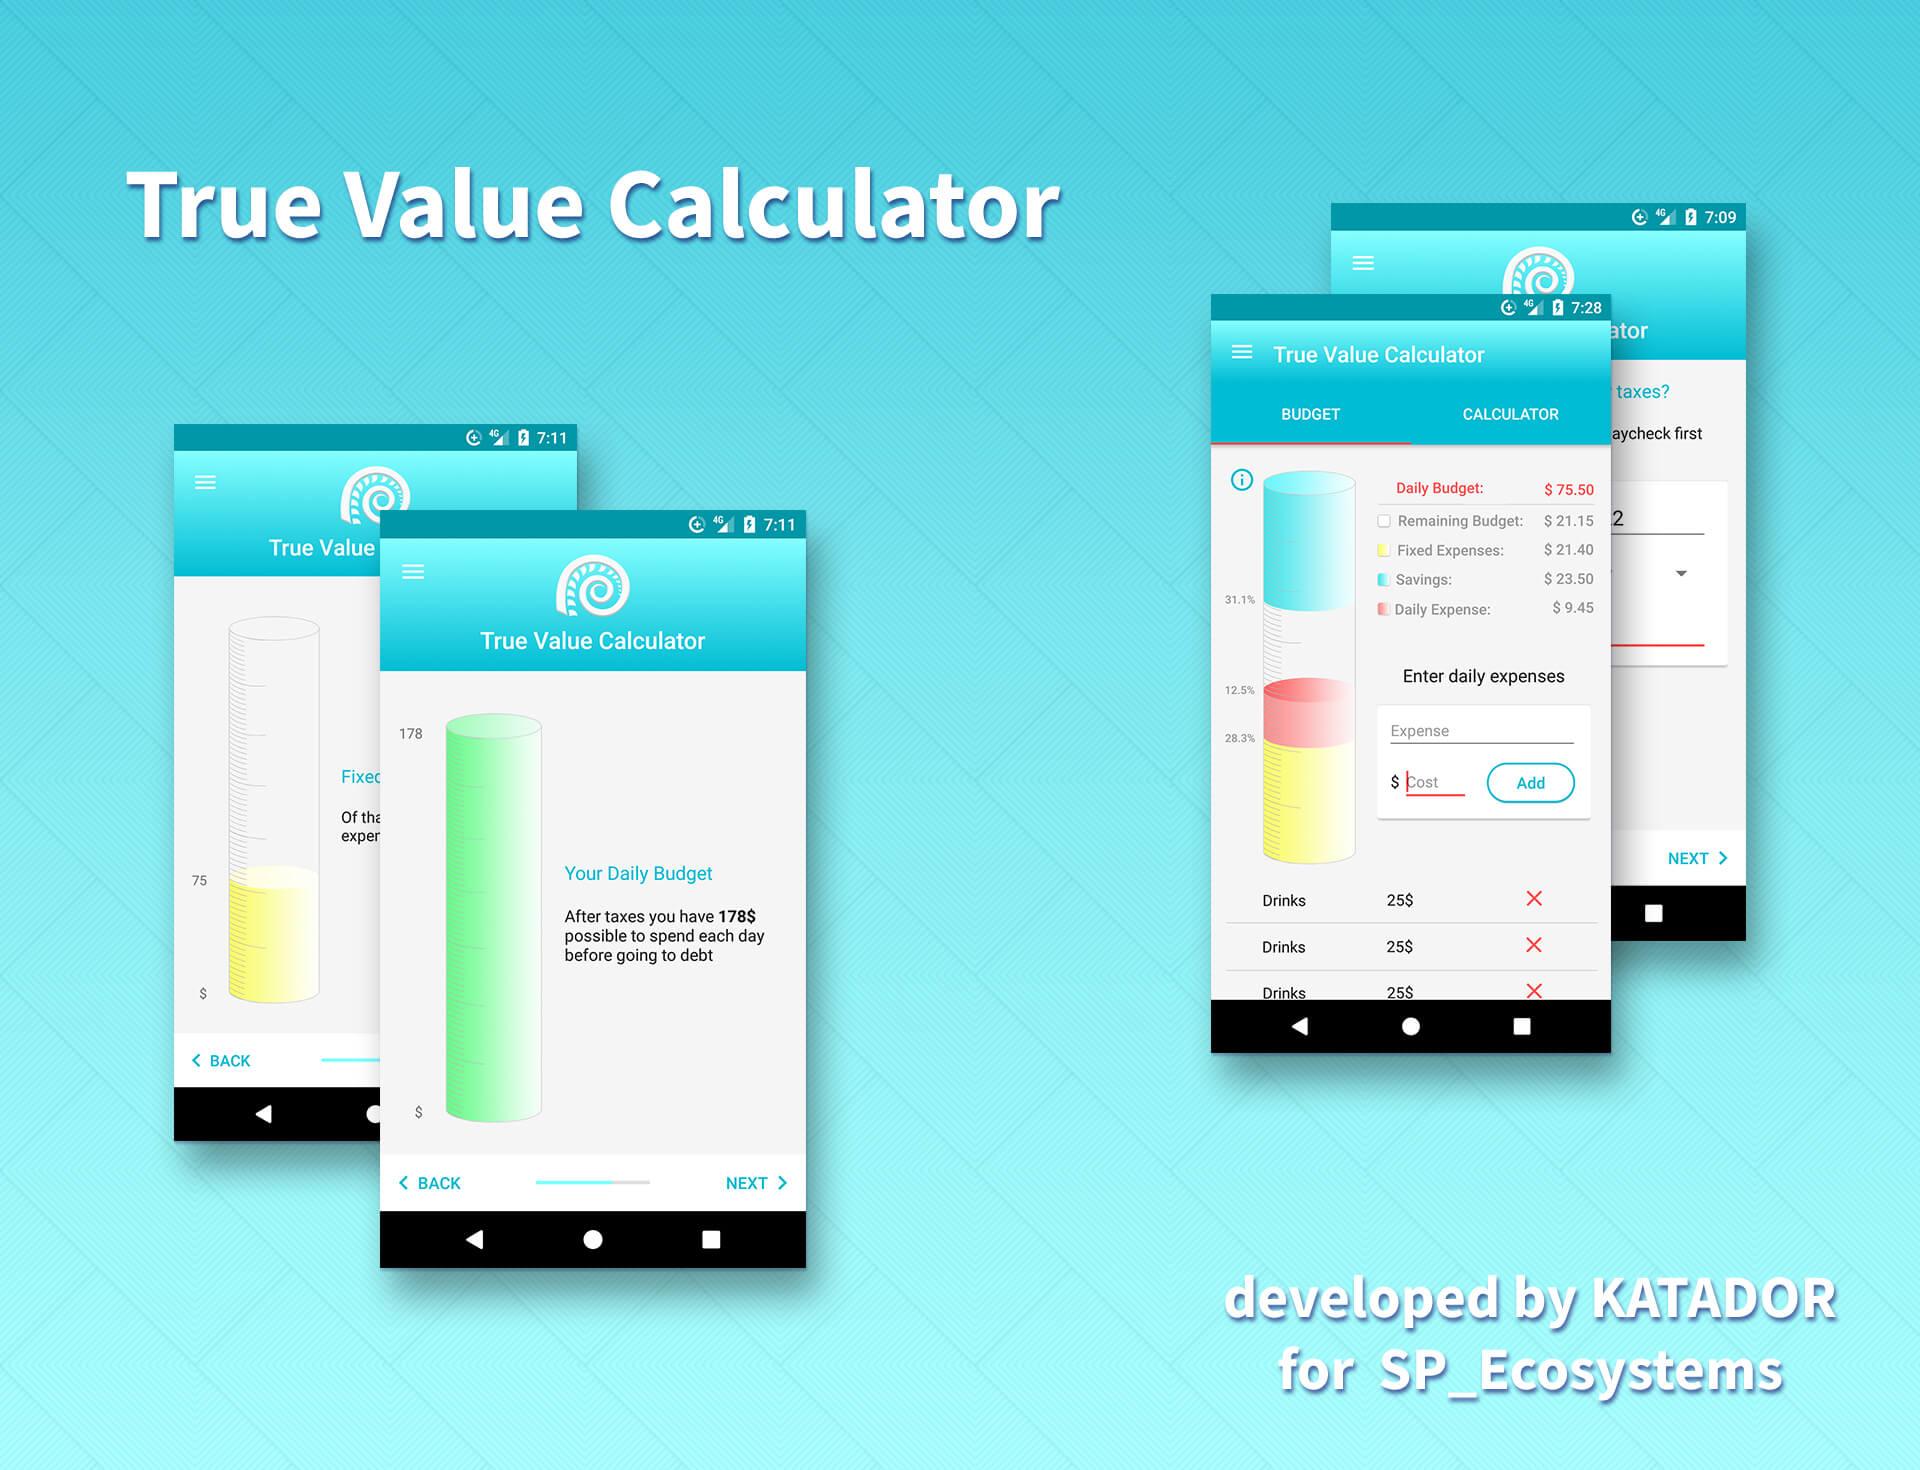 true value calculator detailsl